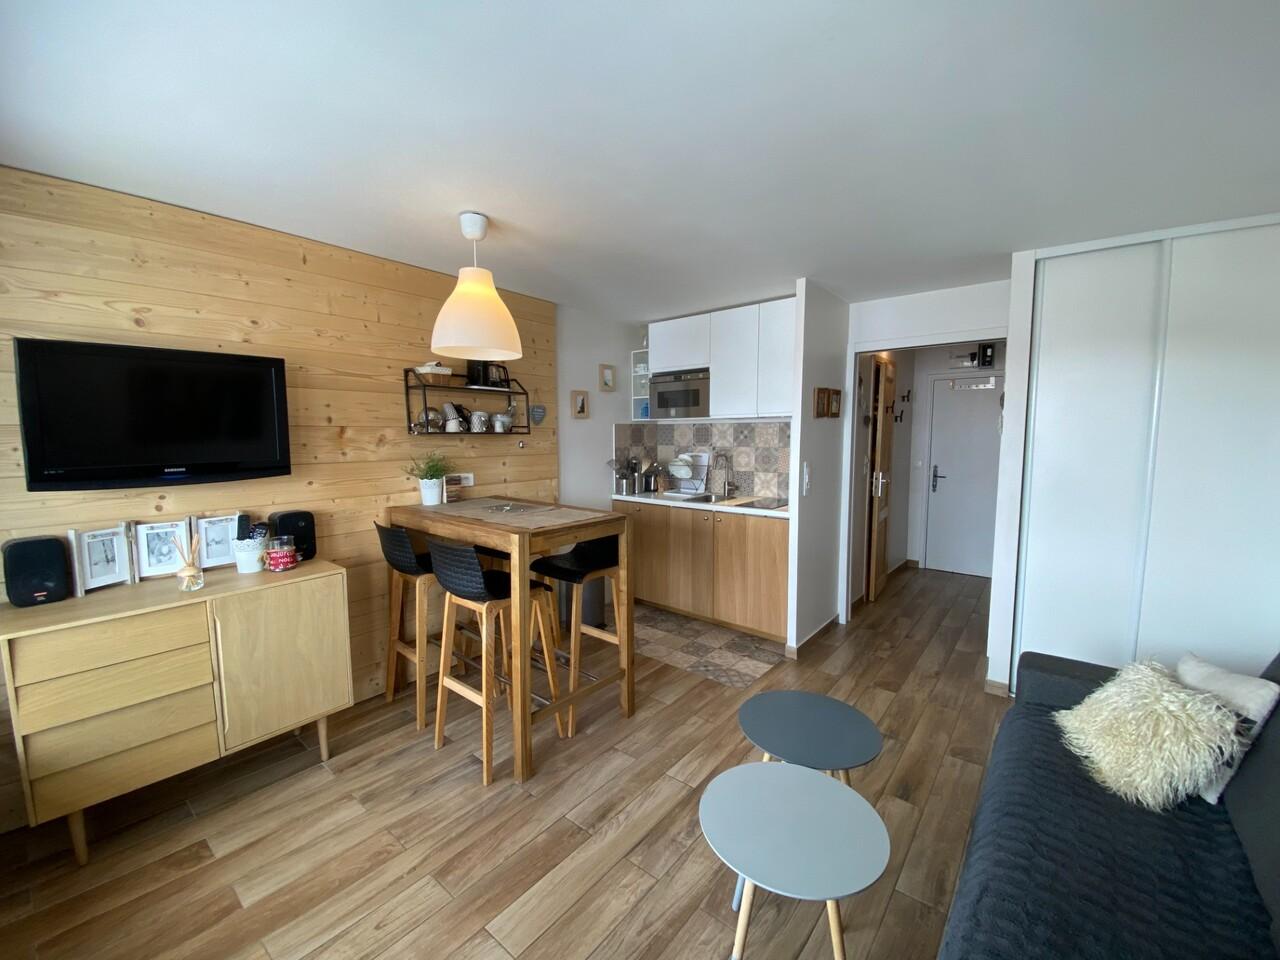 FLAT INTERIEUR MODERENE VAL THORENS Accommodation in Val Thorens